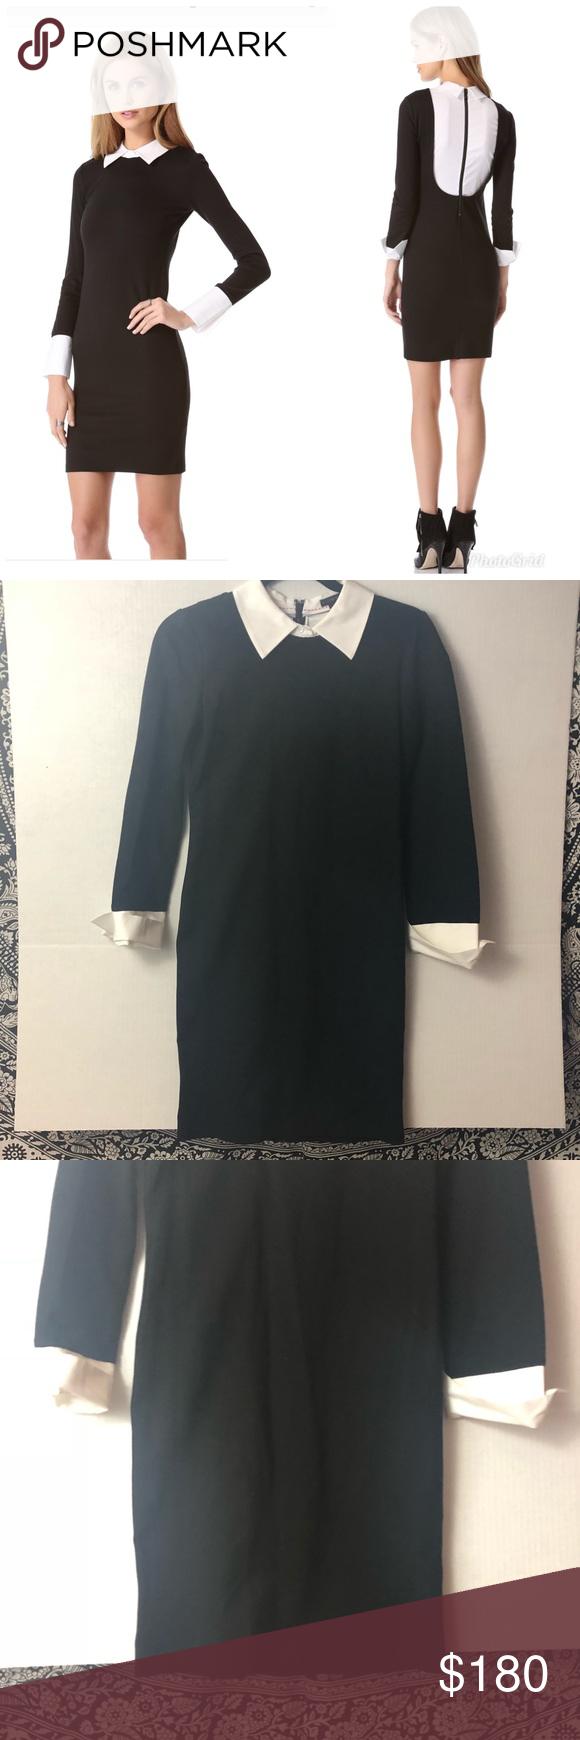 Nwot Alice Olivia Courtnee Collar Dress Collar Dress Dresses Timeless Fashion [ 1740 x 580 Pixel ]